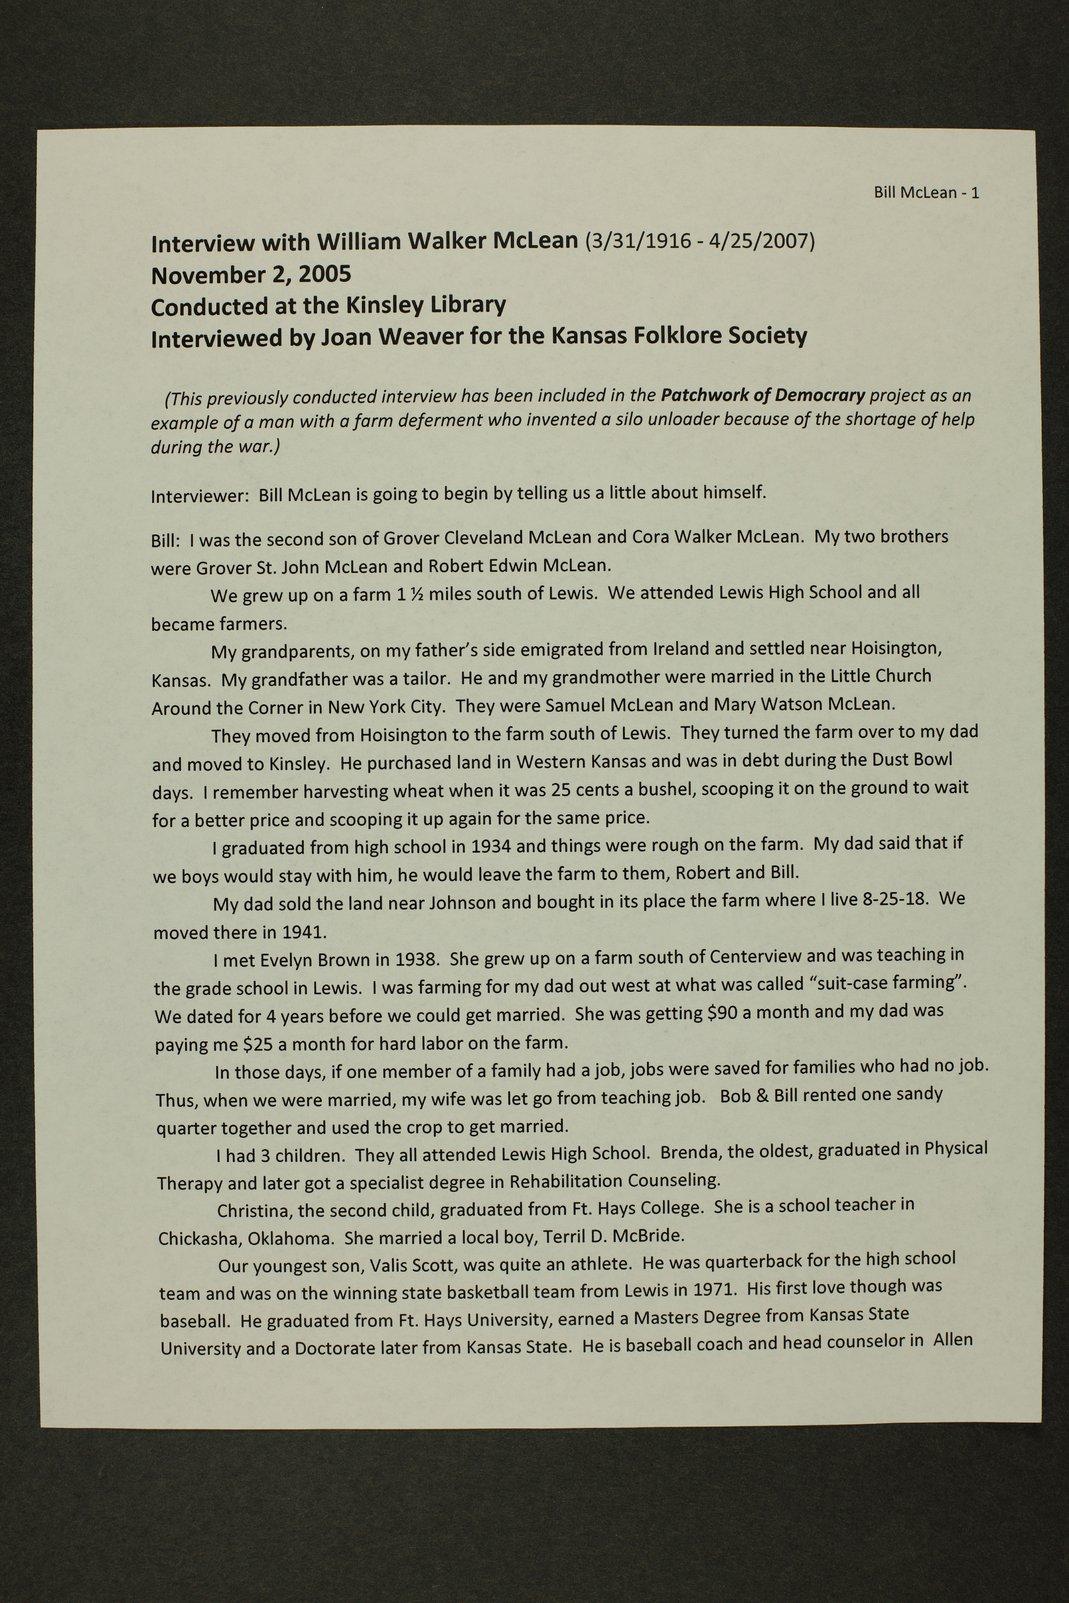 William McLean interview, WWII oral history, Lewis, Kansas - 1